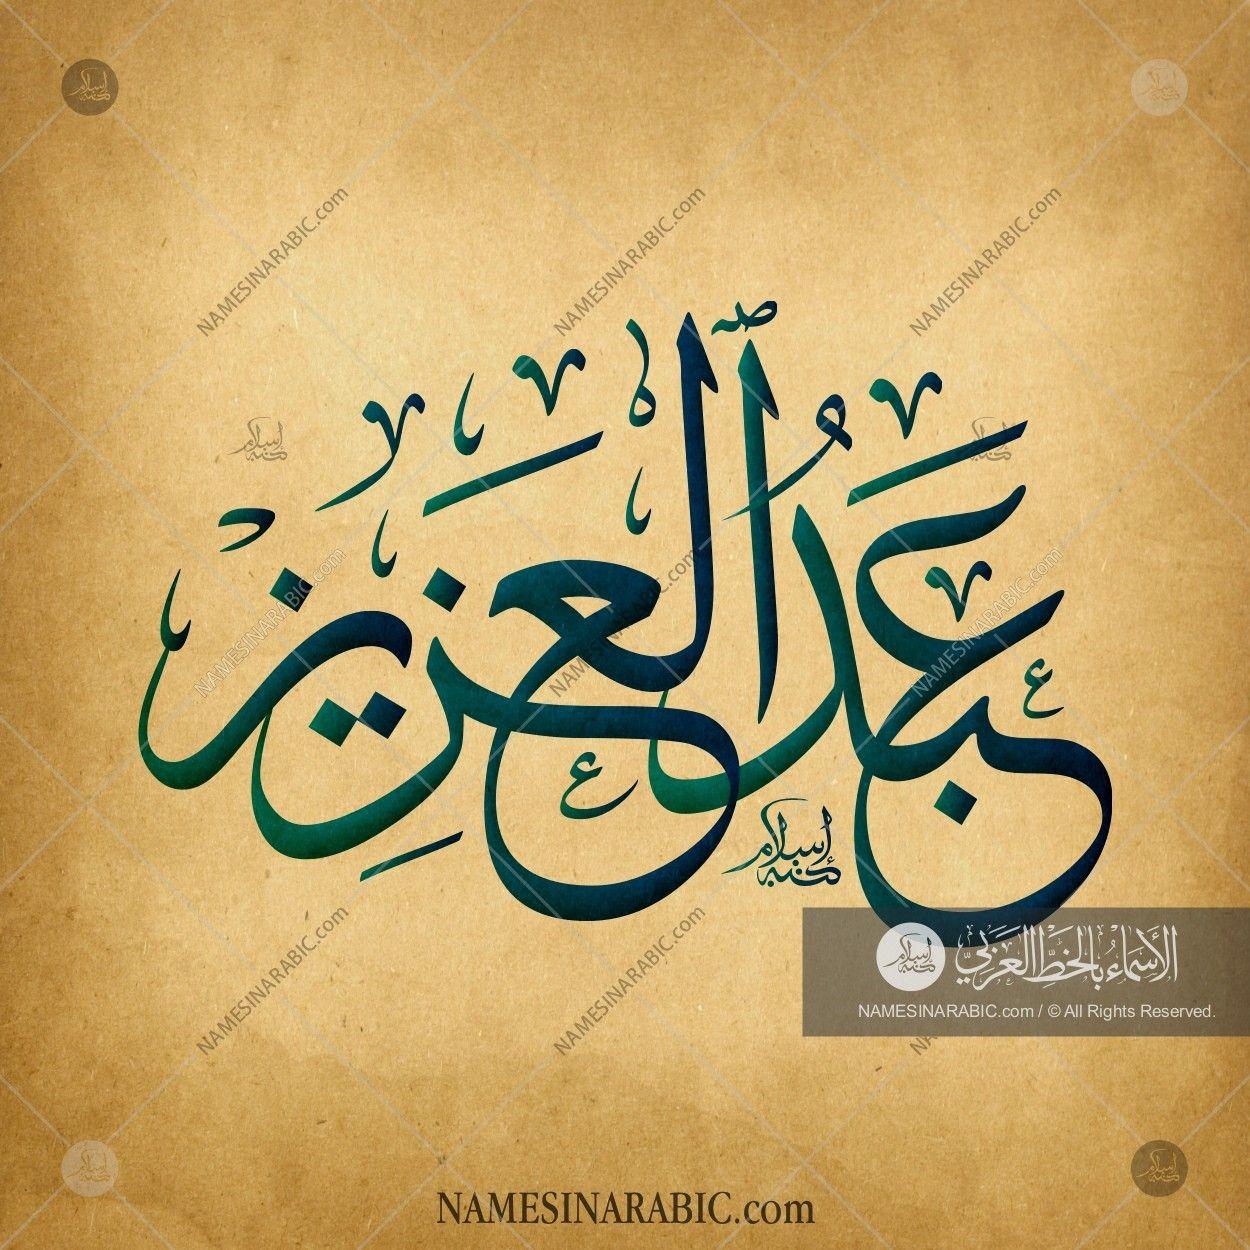 Abdul Aziz عبد العزيز Names In Arabic Calligraphy Name 3210 Calligraphy Name Calligraphy Caligraphy Art